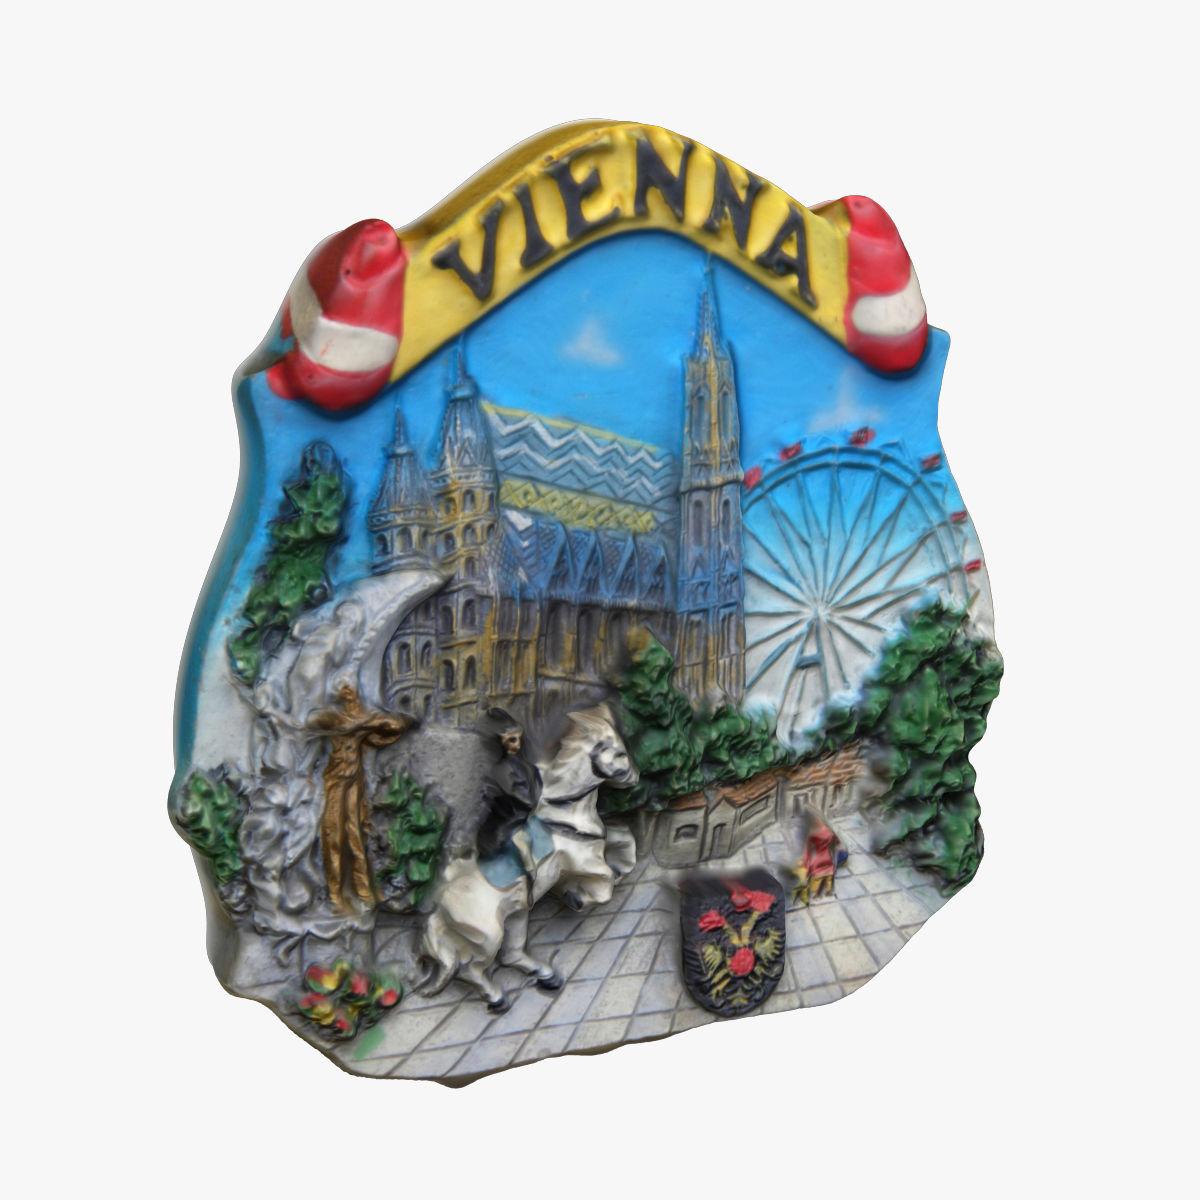 Vienna Austria Magnet Souvenir